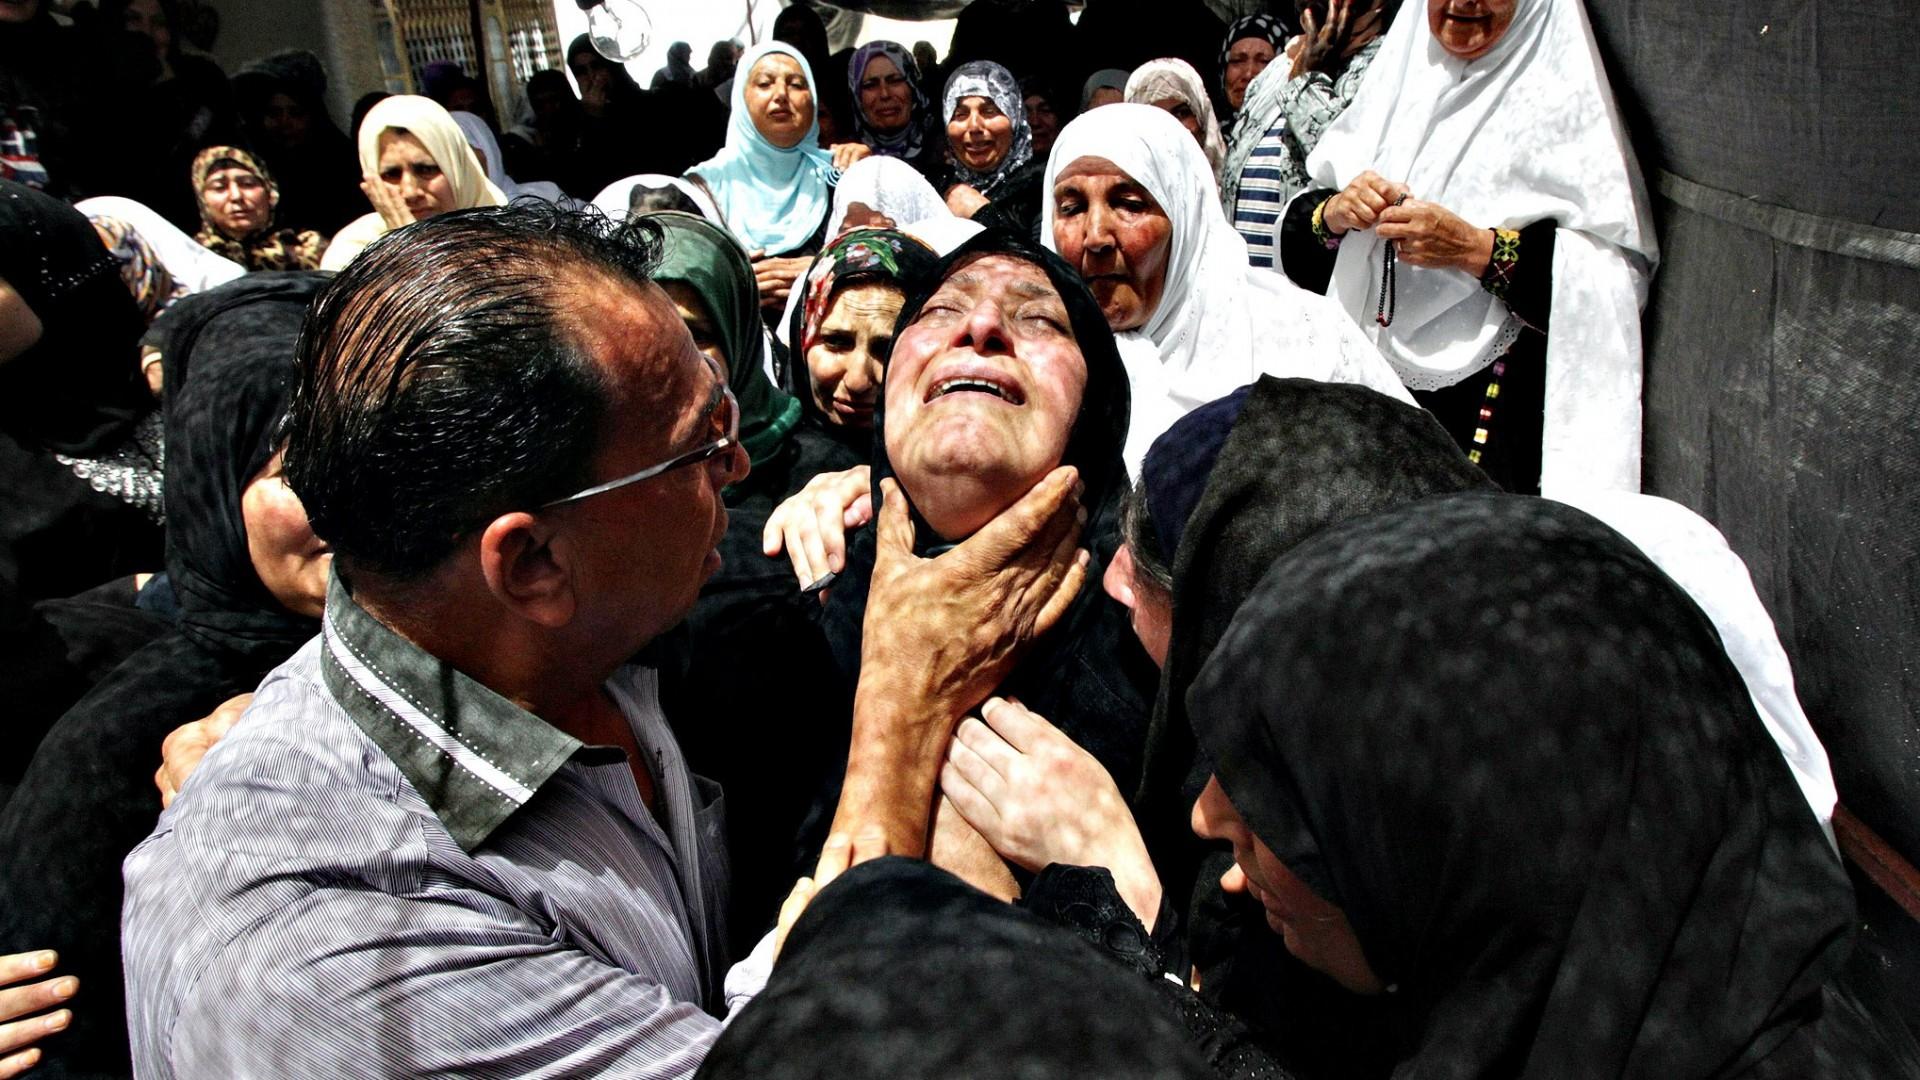 https://roarmag.org/wp-content/uploads/2016/01/PalestineFuneral-e1453660755634-1920x1080.jpg